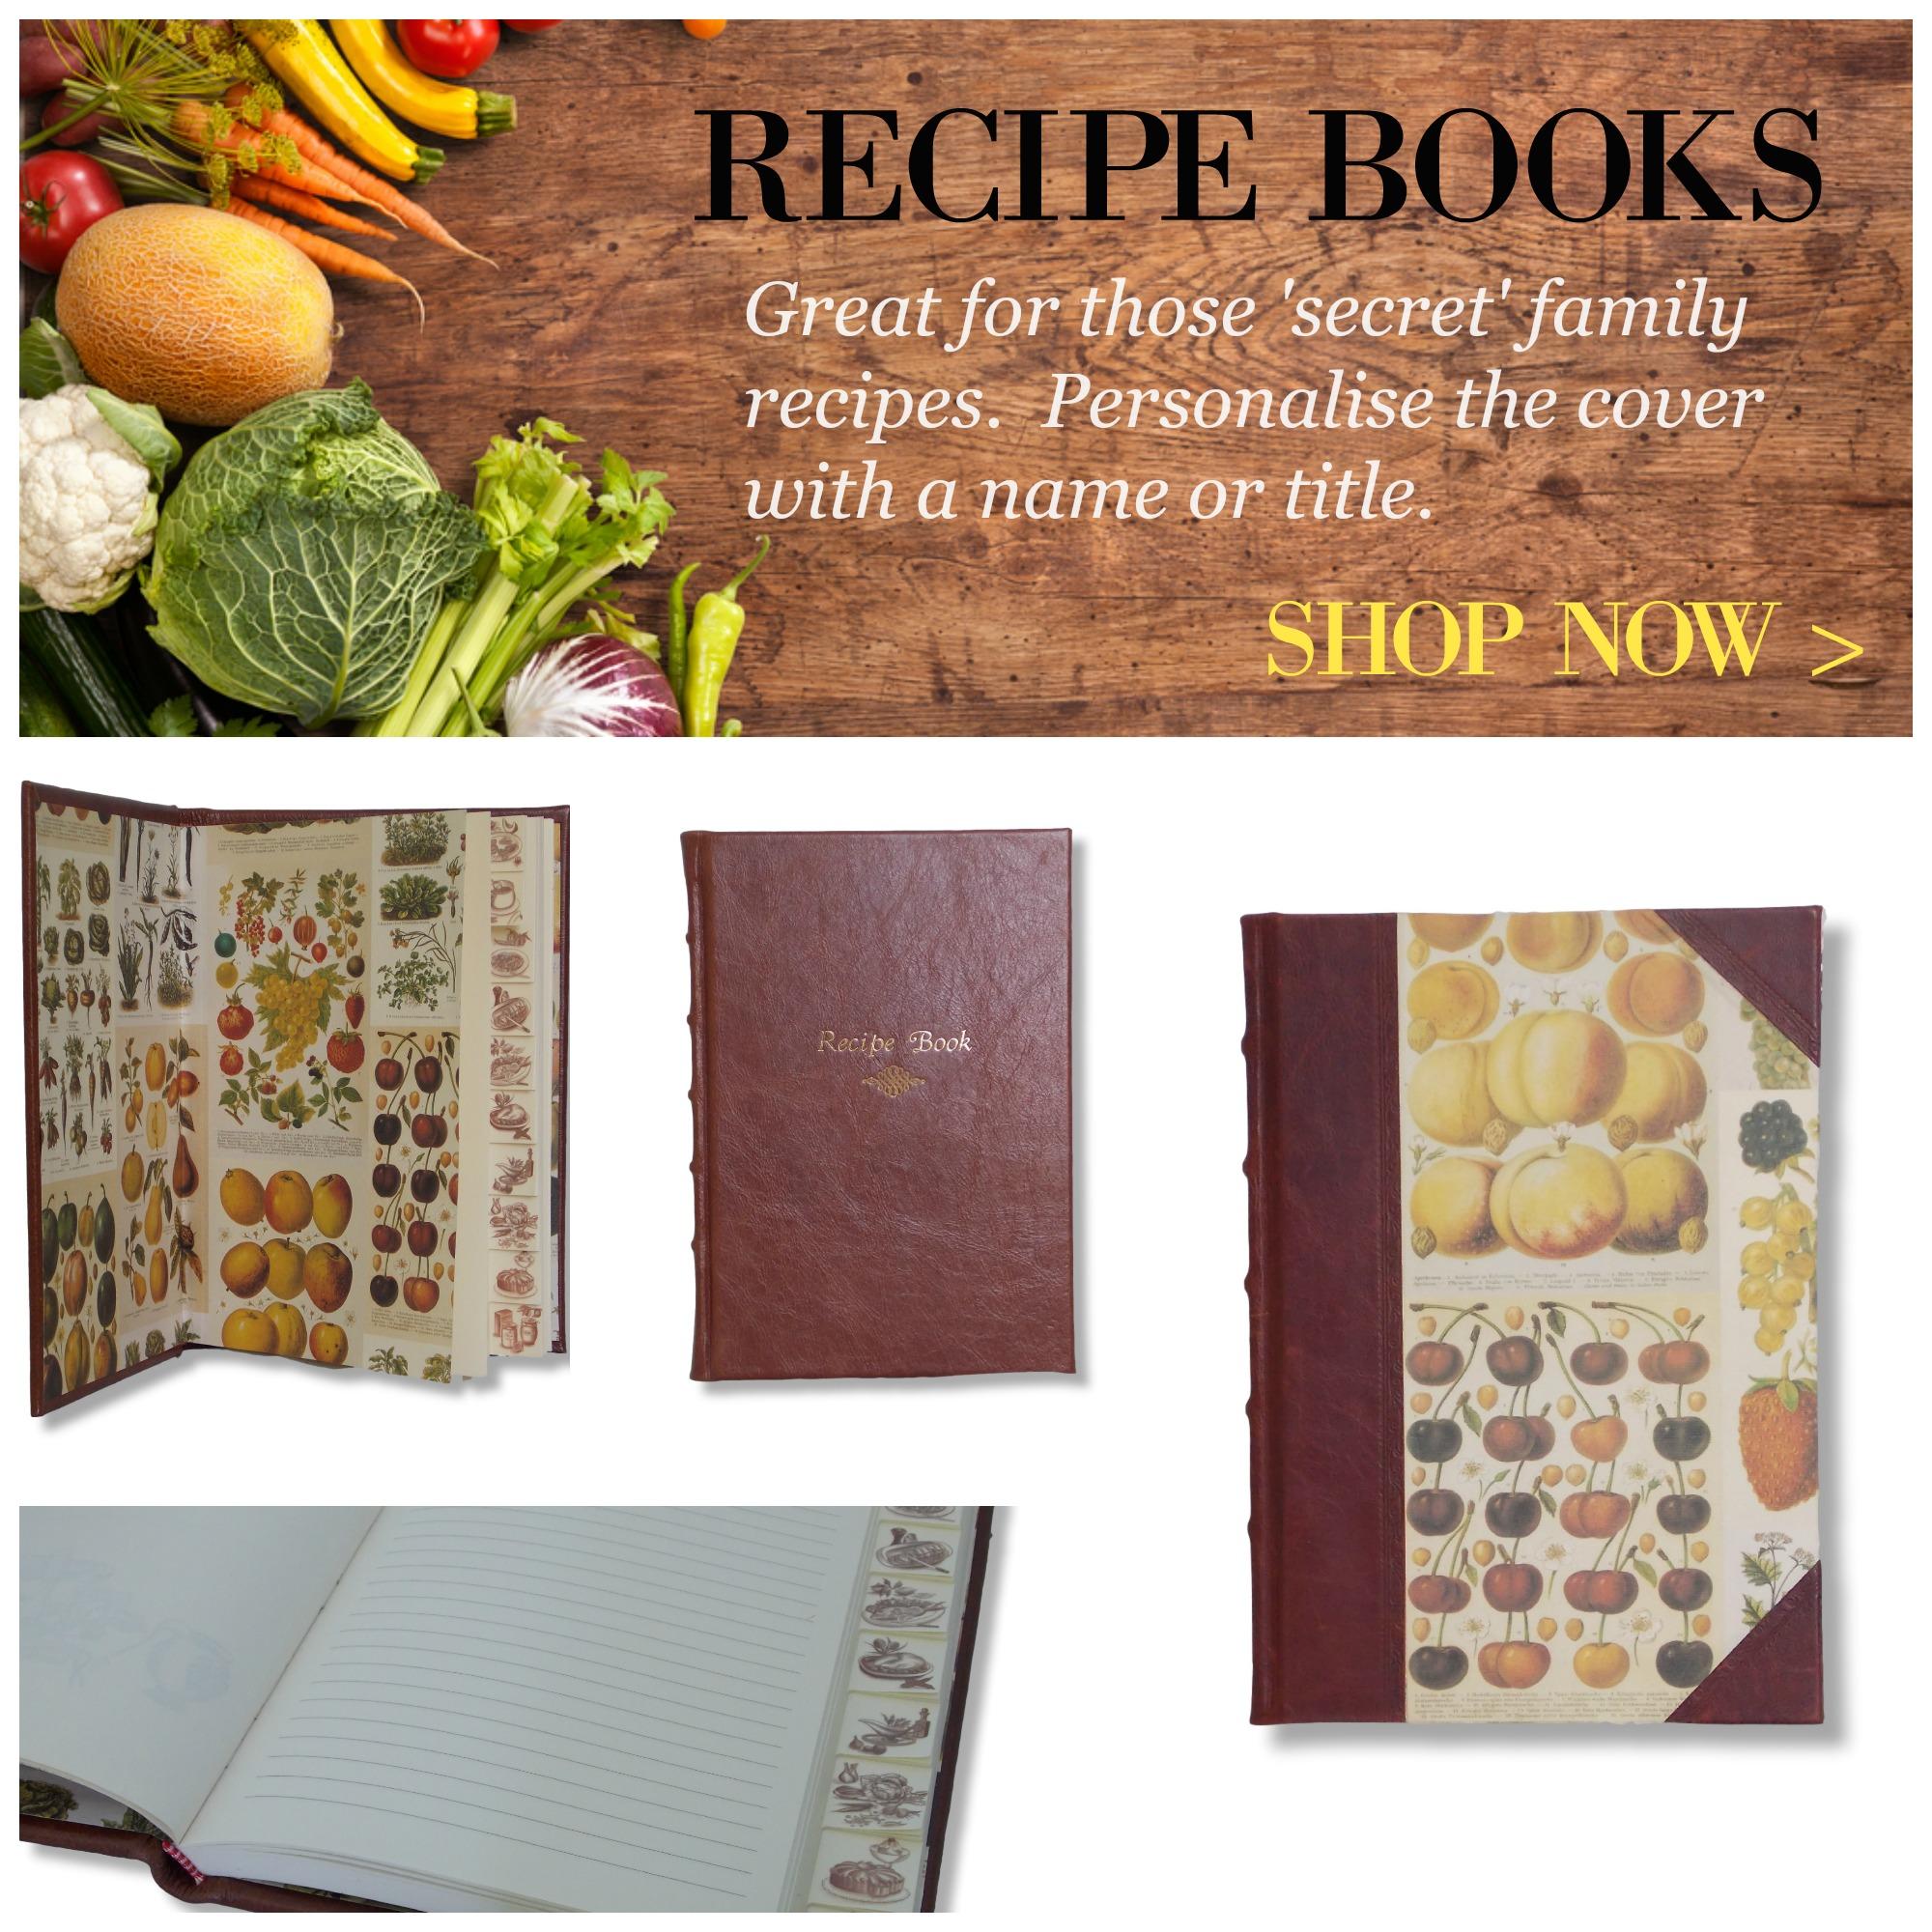 Handcrated Recipe Books